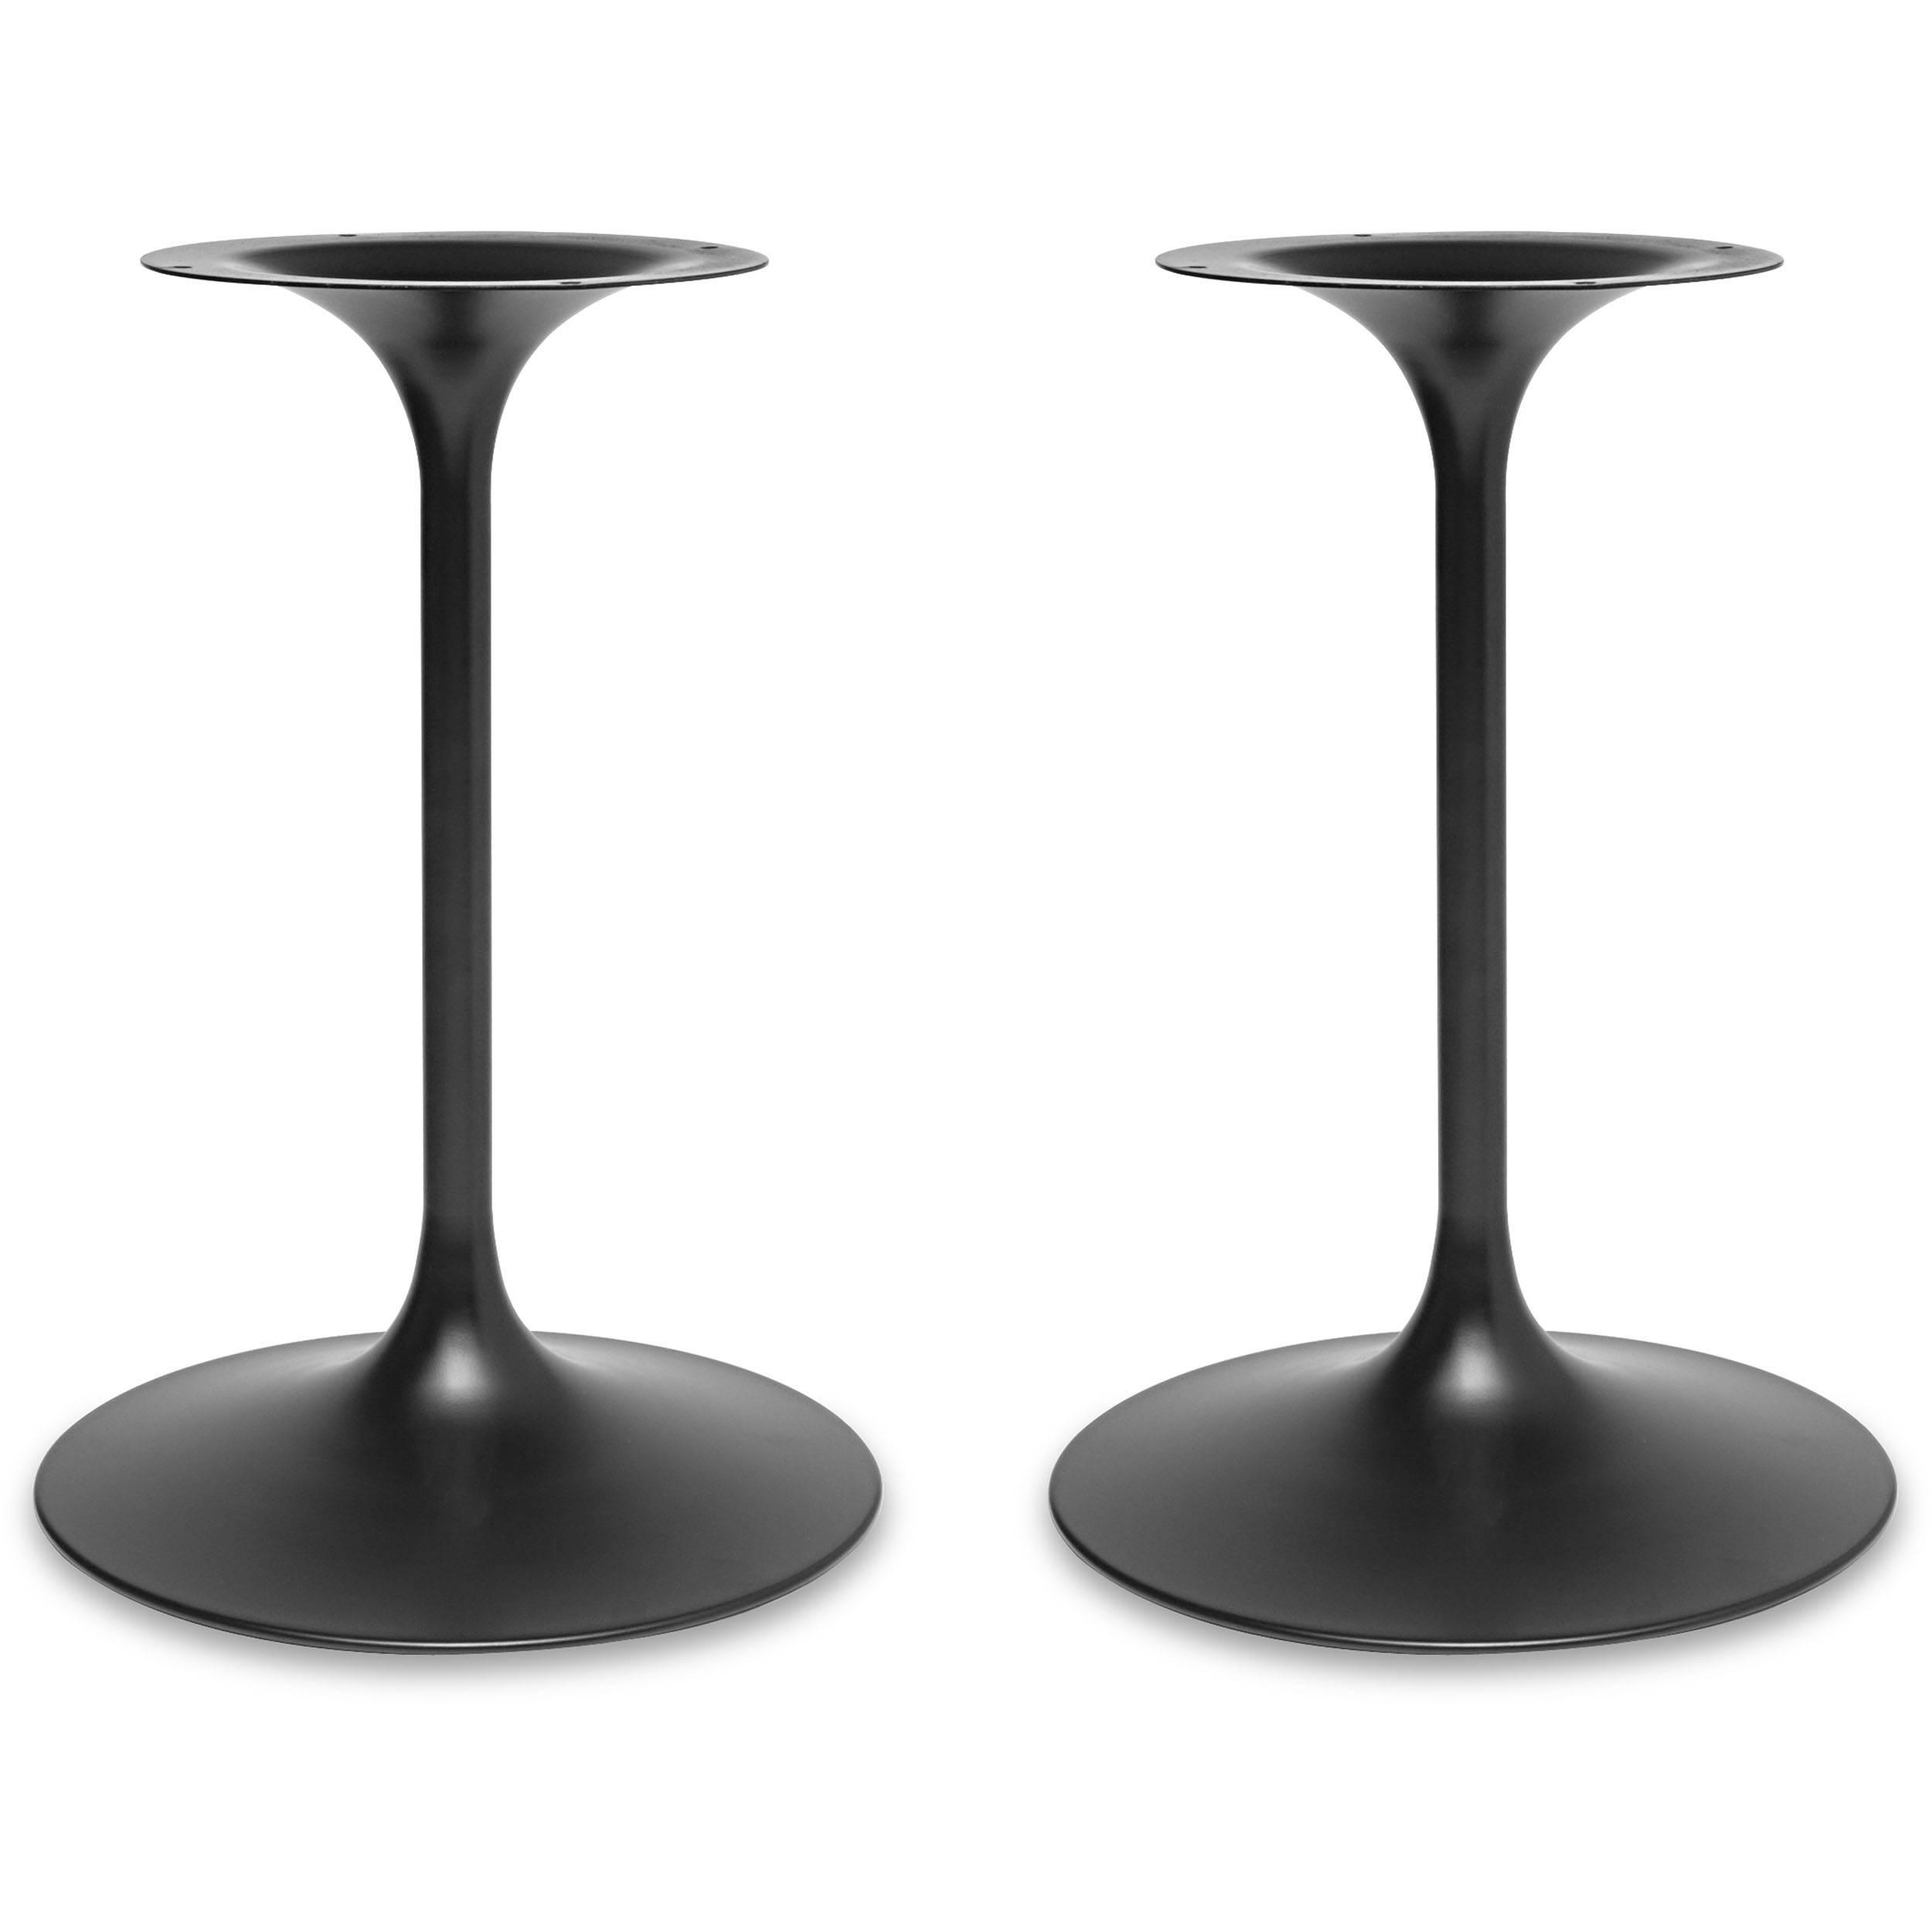 Bose 901 Speaker Pedestals Pair